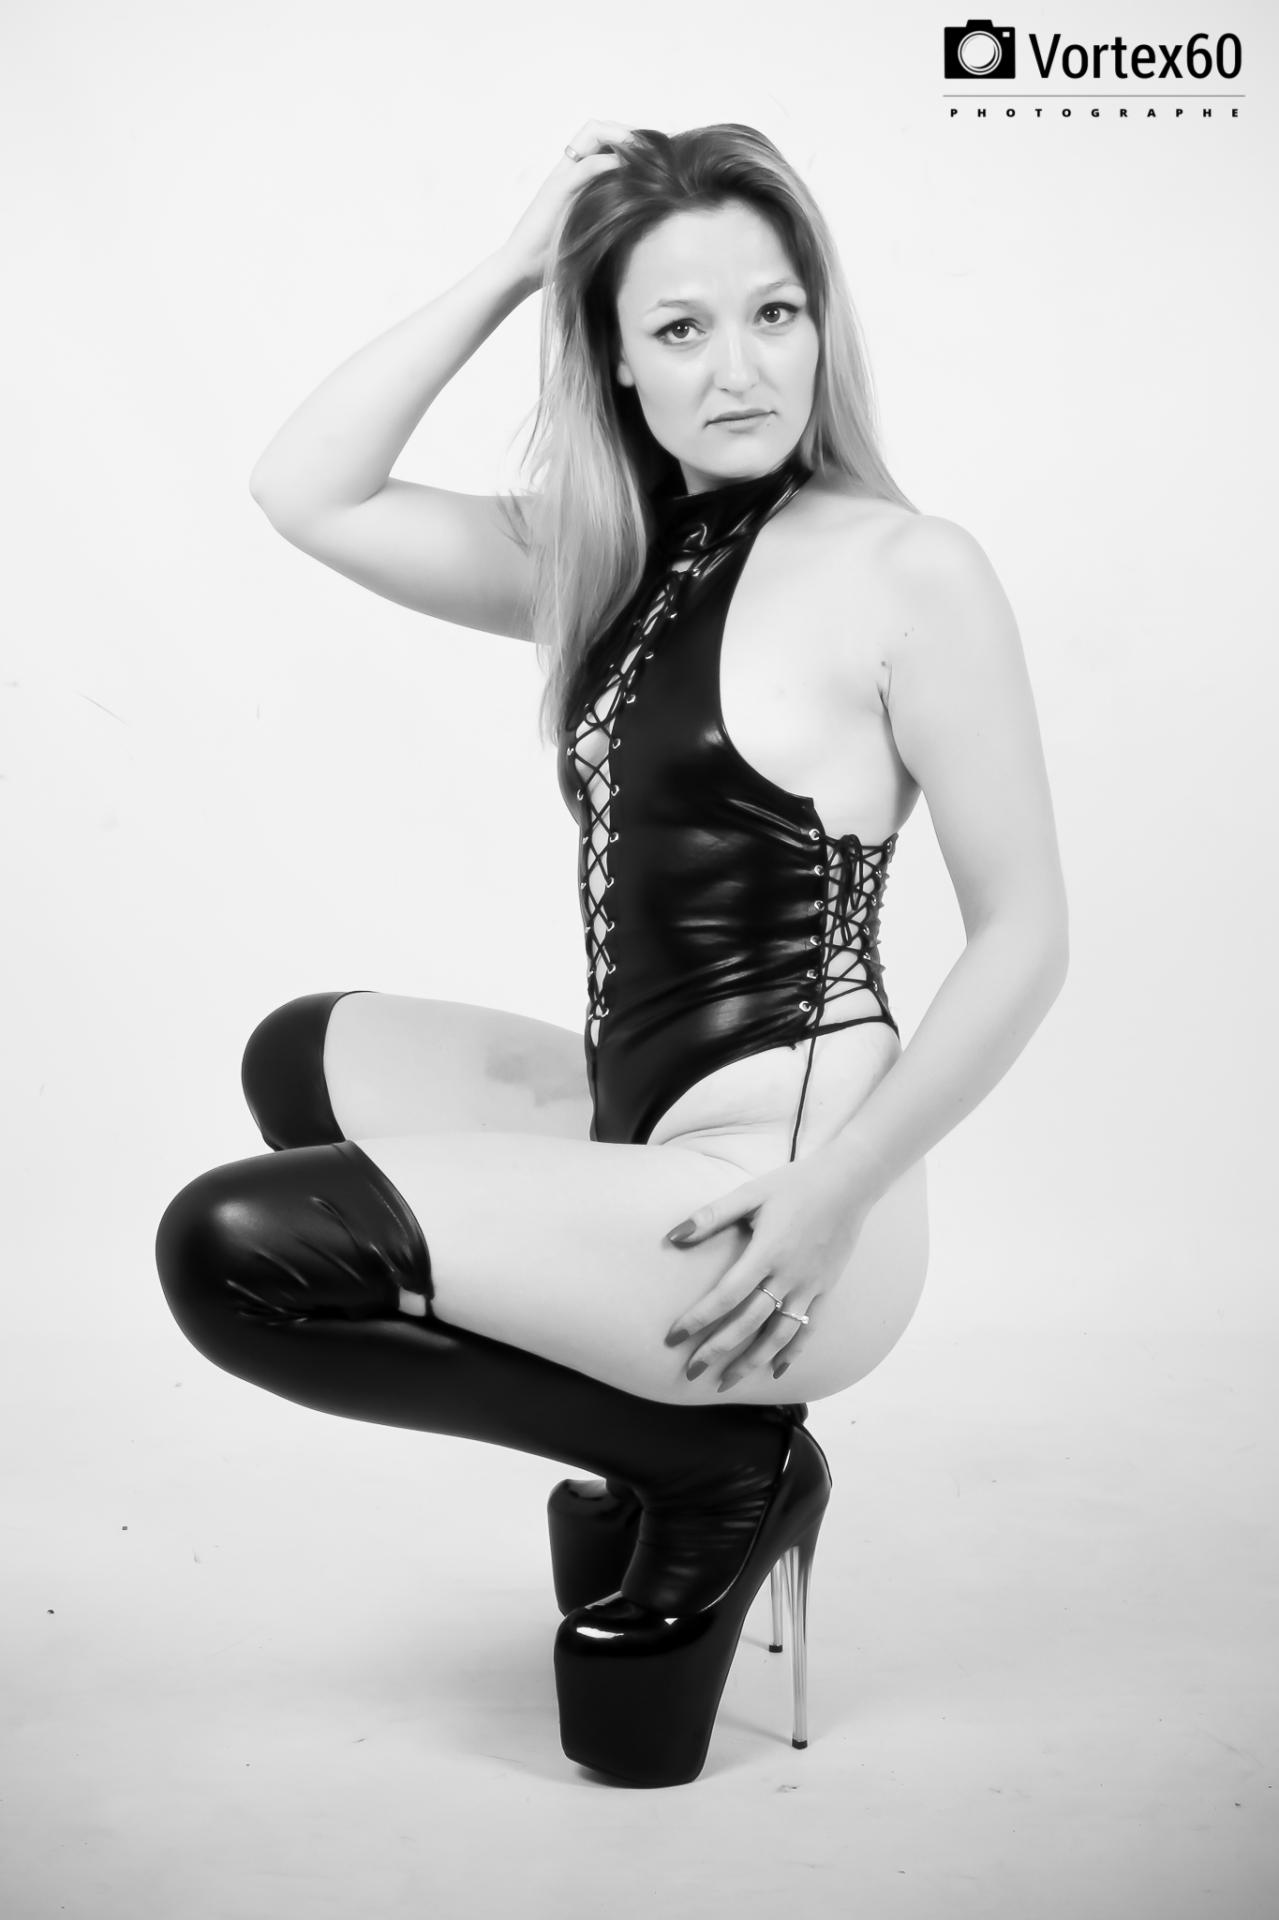 Loanne Mélissa Hasbrouck en mode dominatrice by vortex60 Photographe